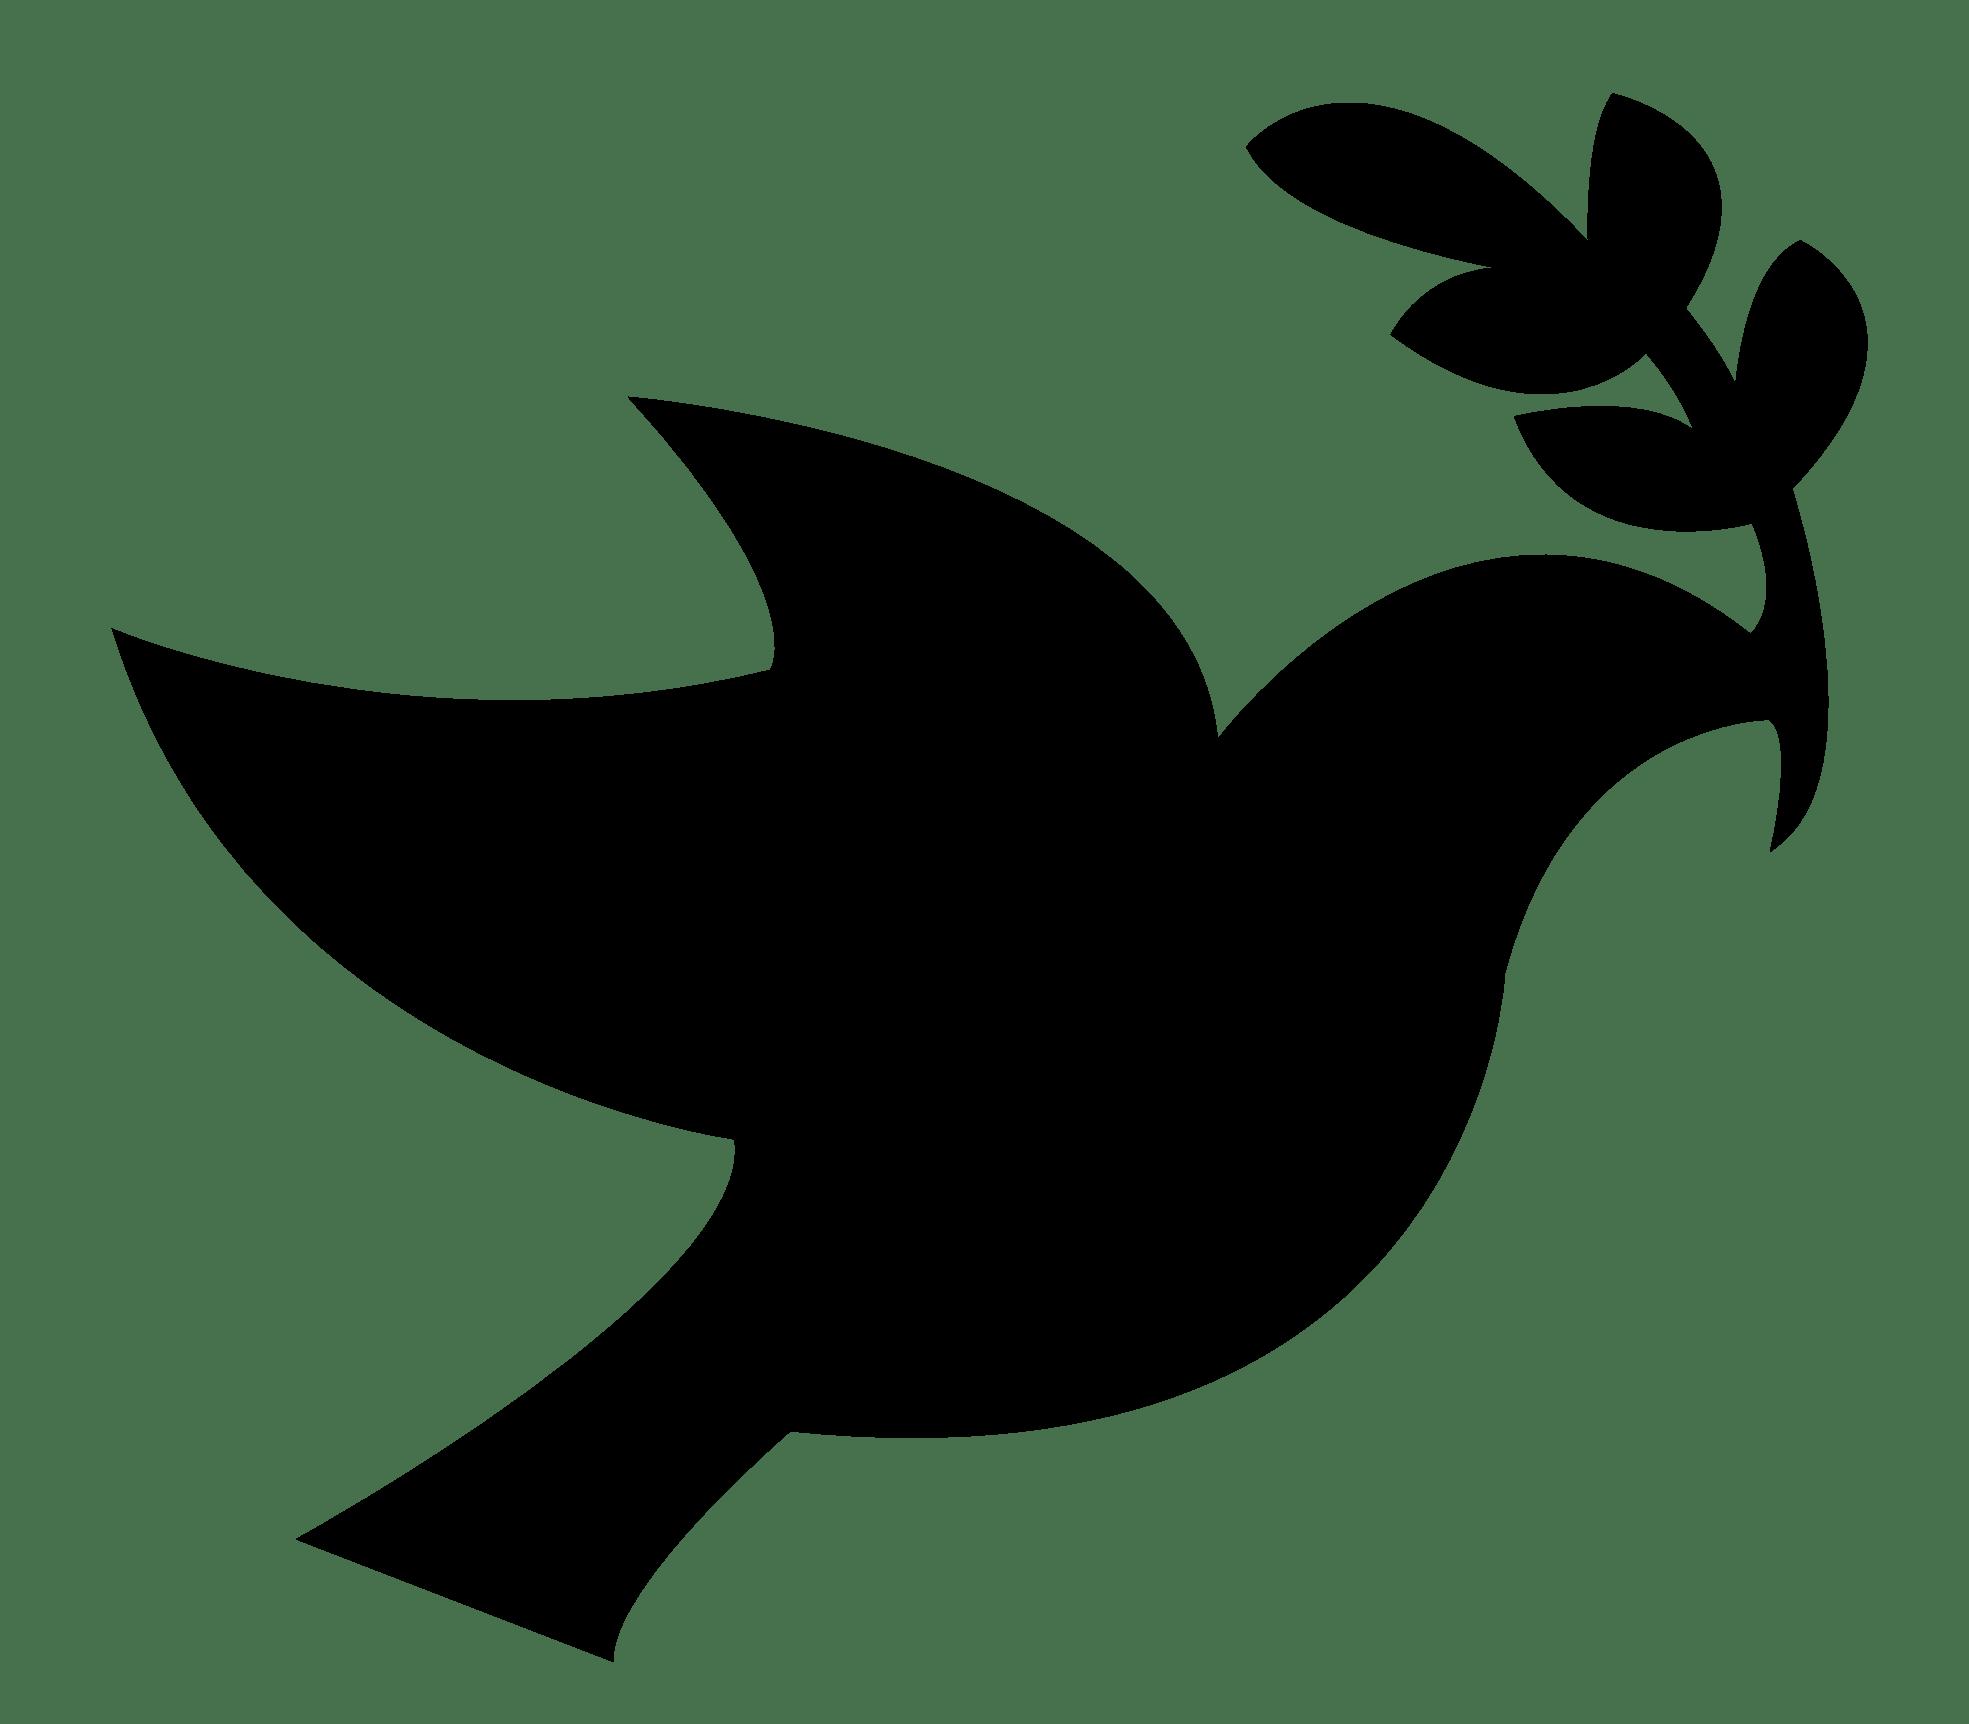 Peace dove png stickpng. Doves clipart transparent background